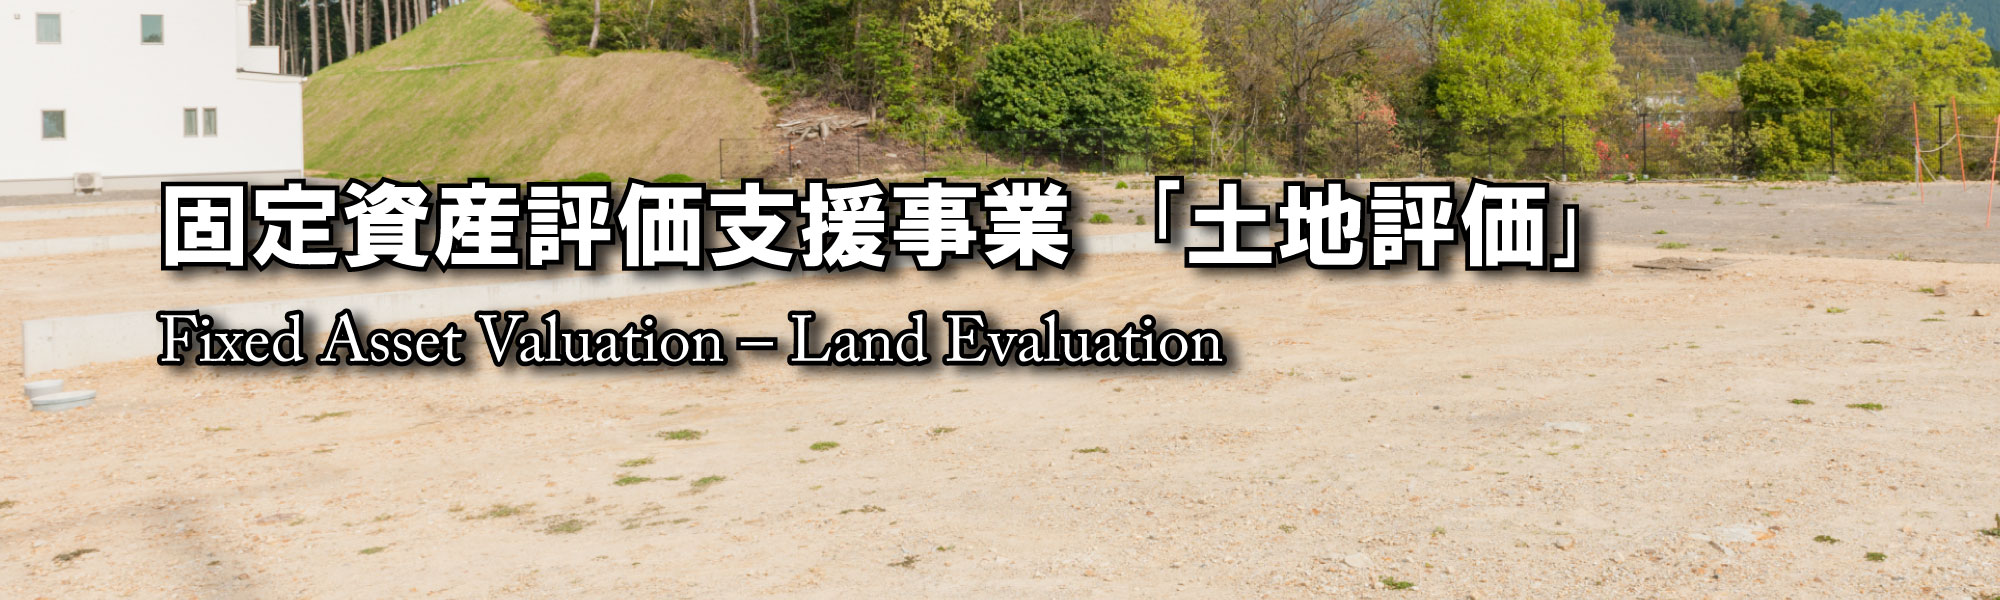 固定資産評価支援事業「土地評価」 - Fixed Asset Valuation - Land Evaluation